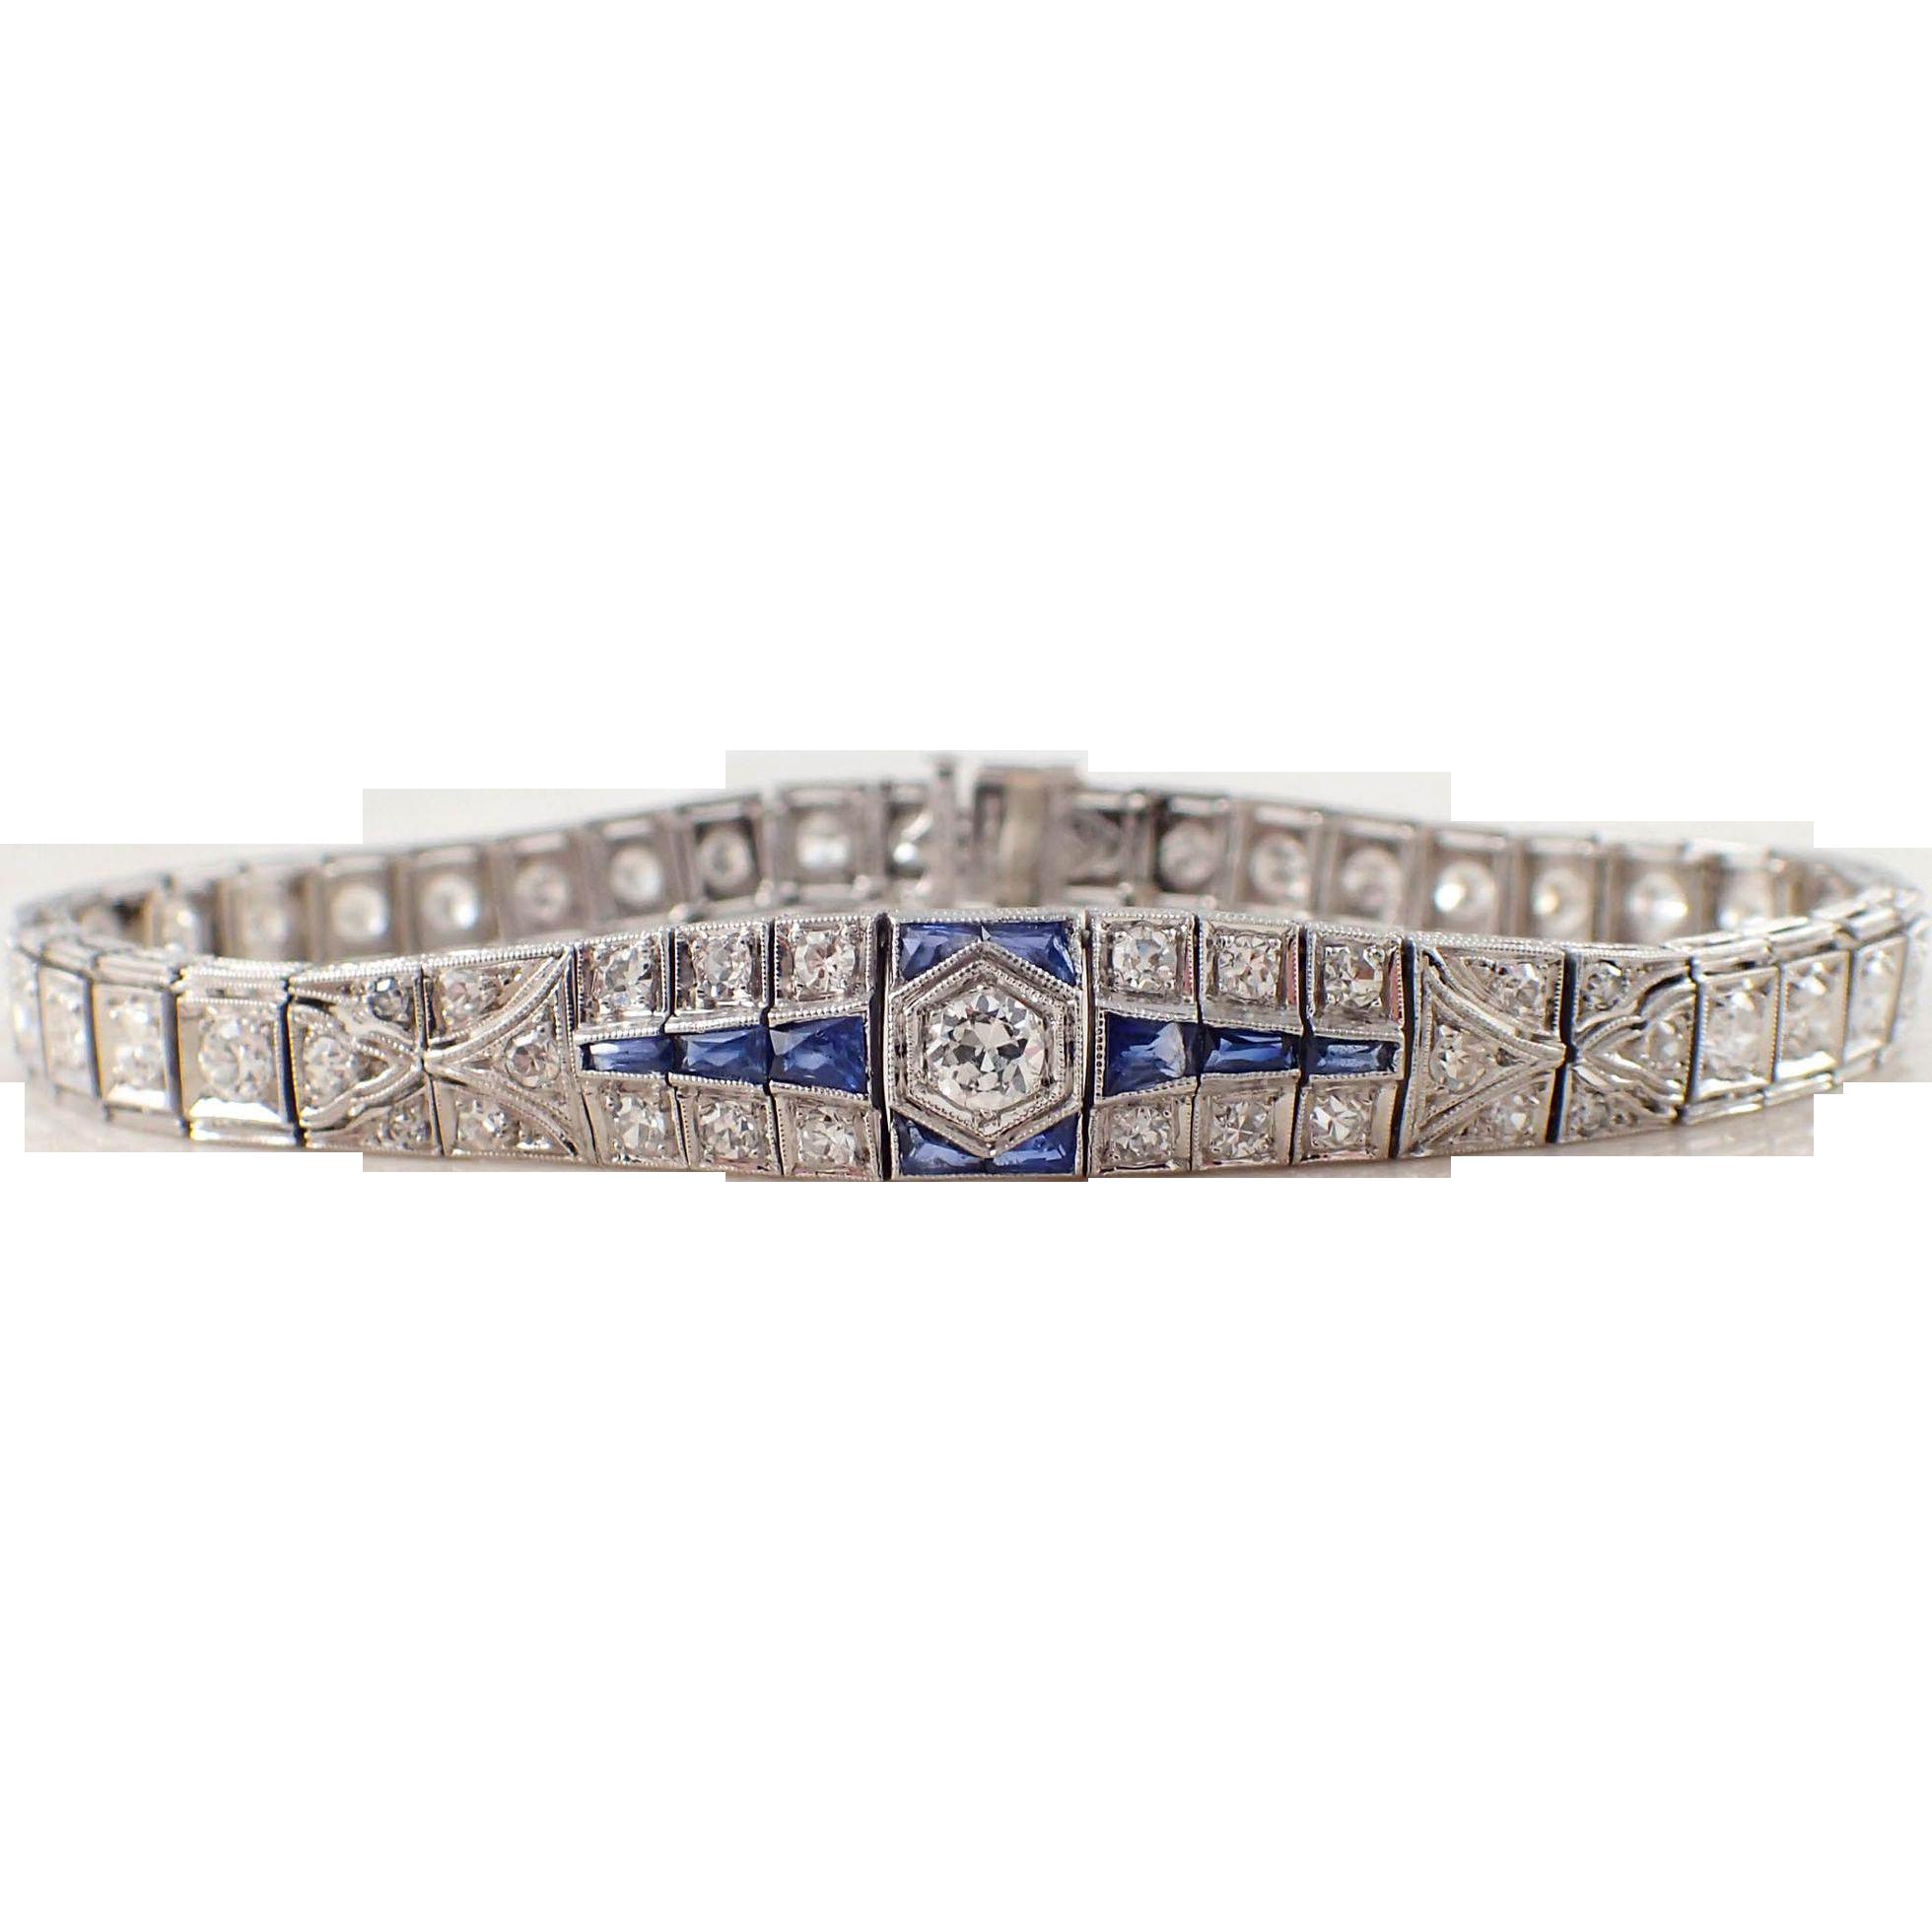 platinum diamond and sapphire art deco bracelet from